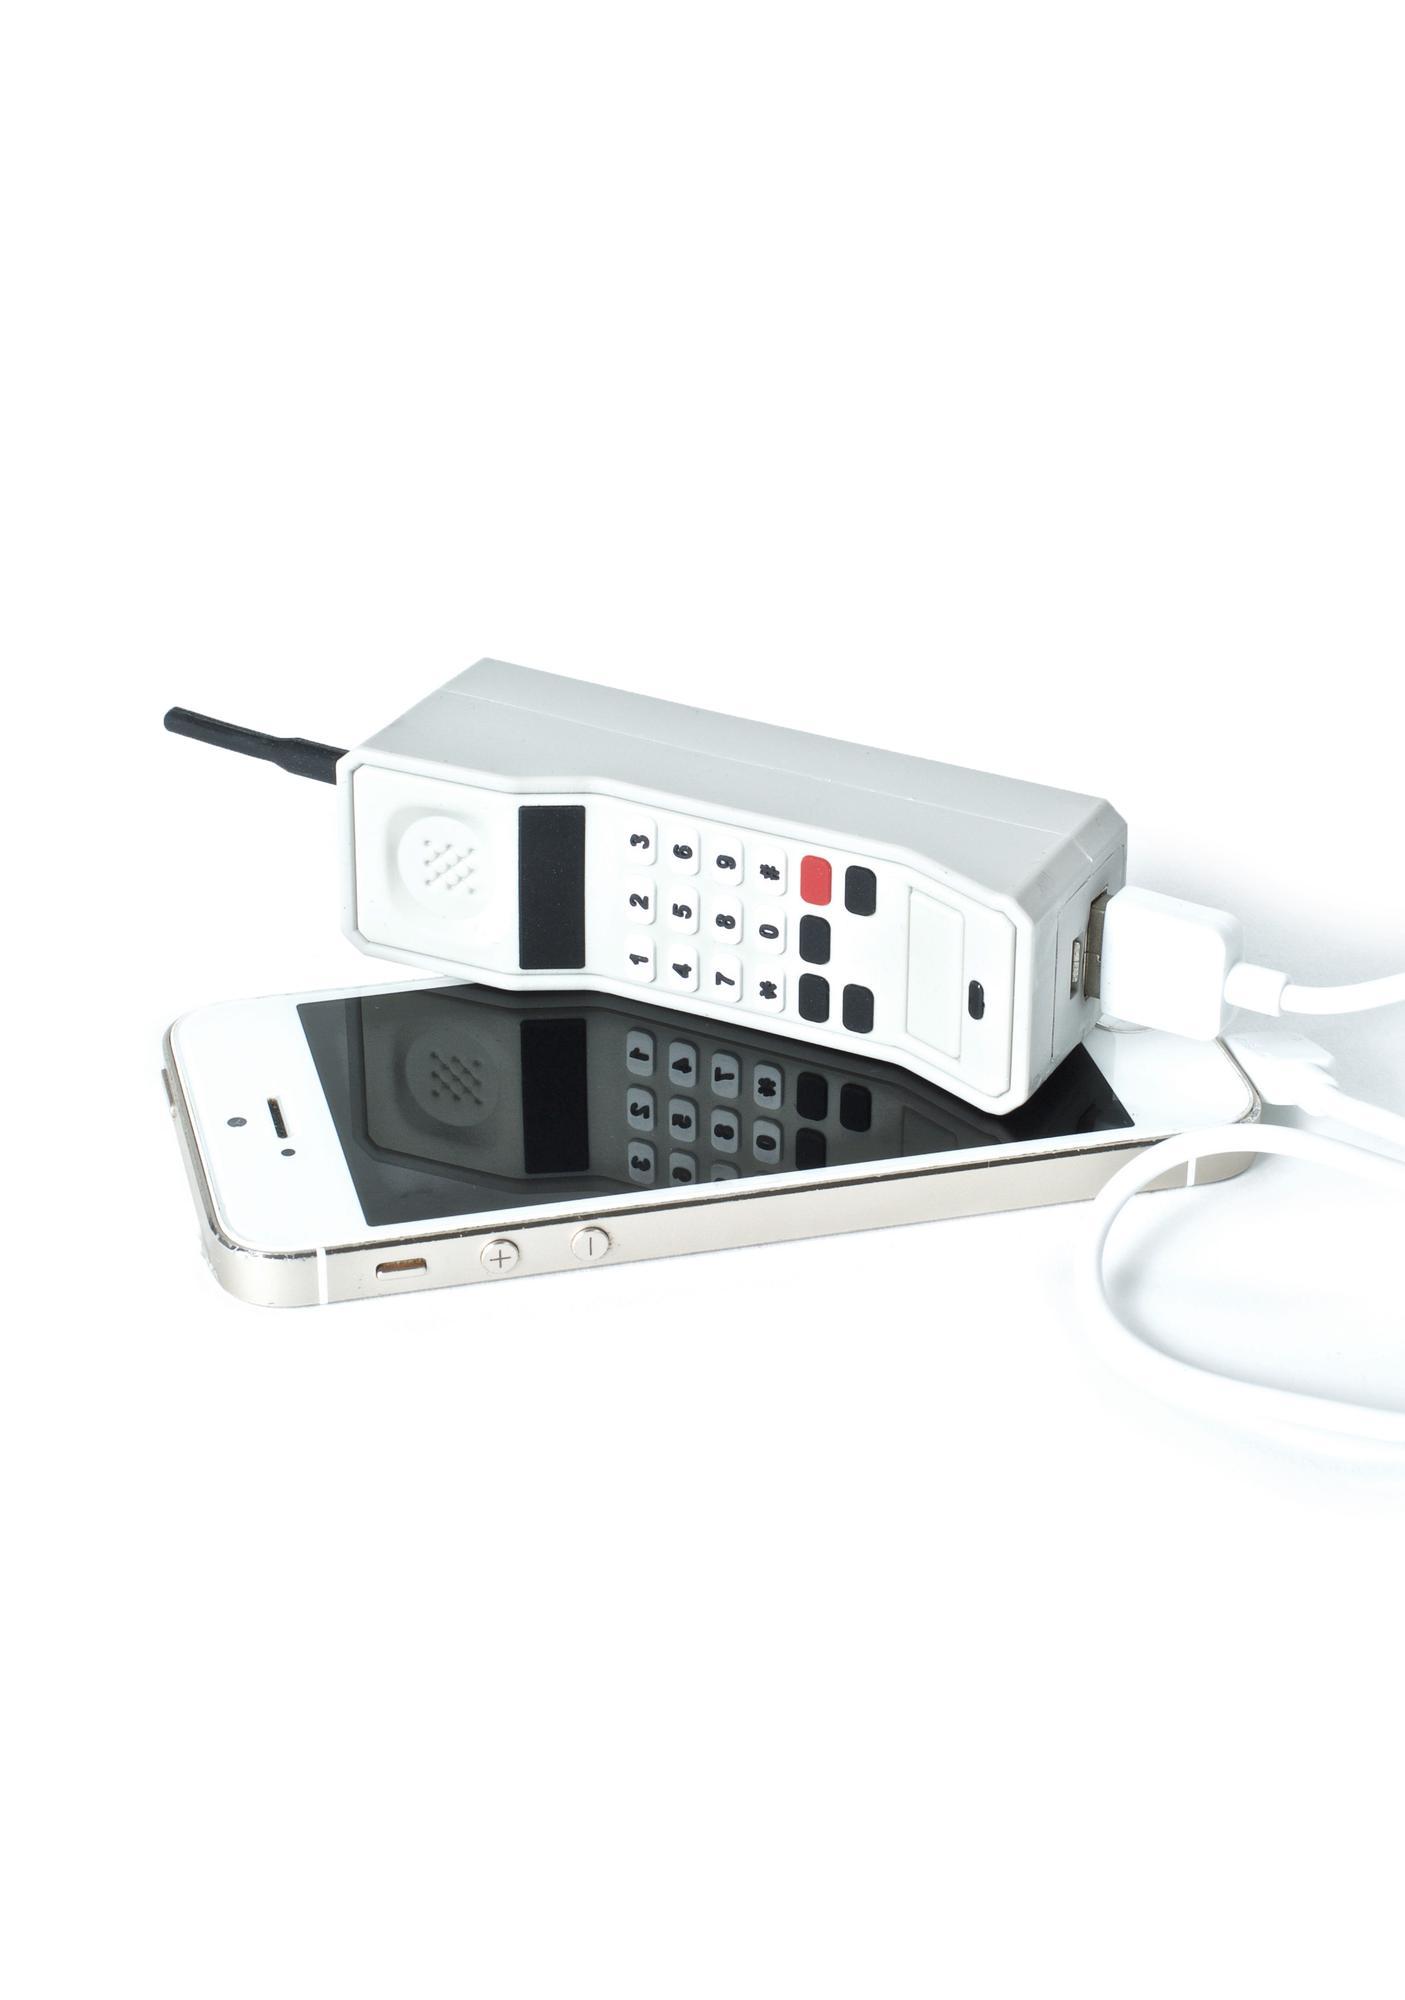 Wattzup Brick Phone Power Bank